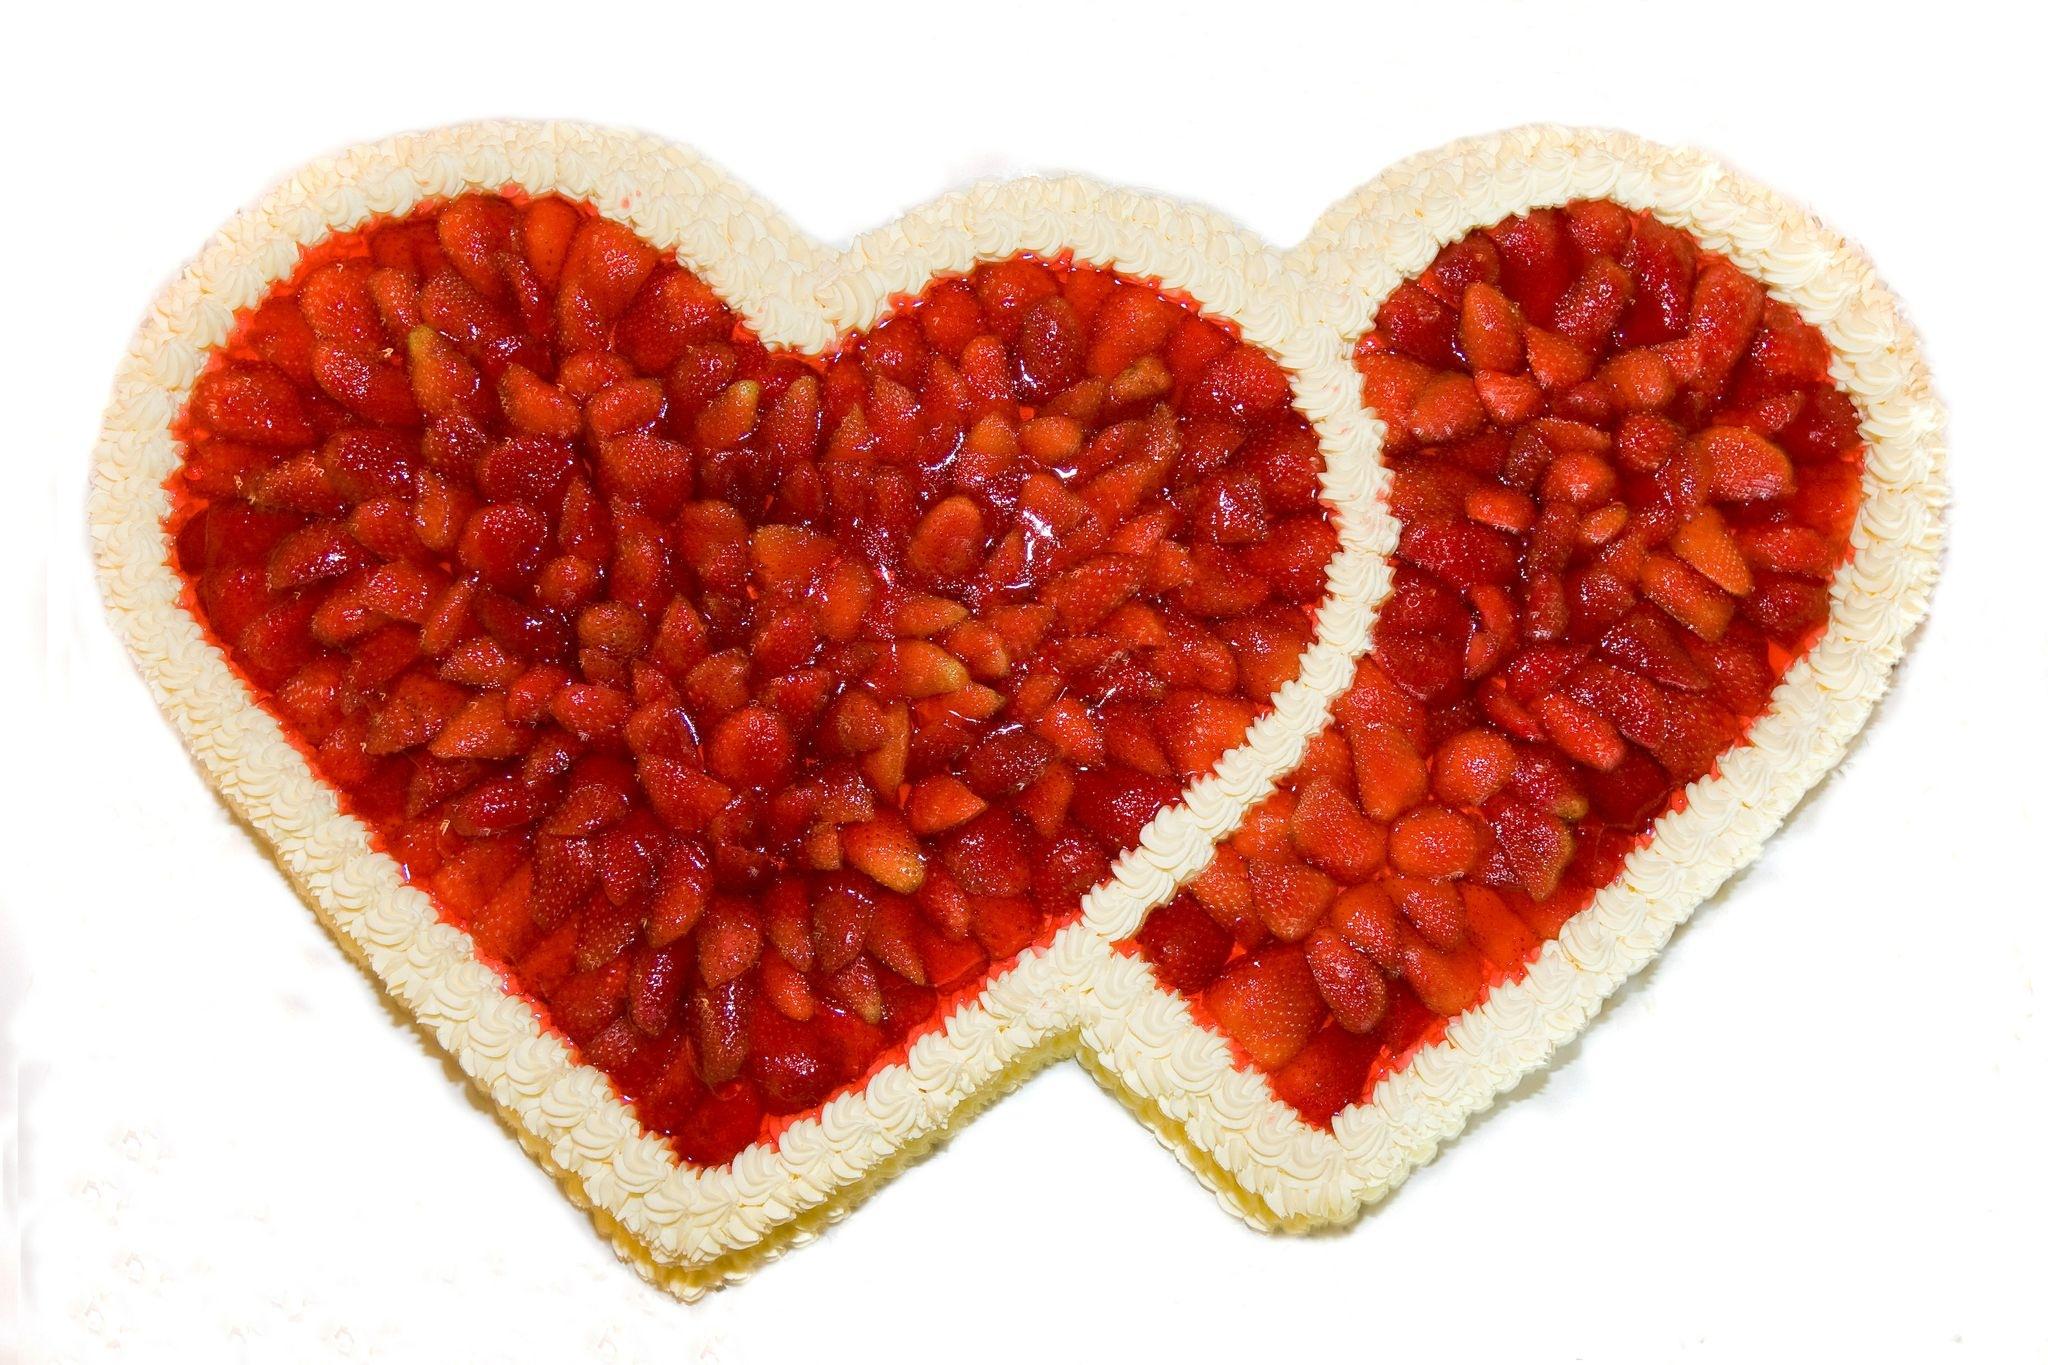 Erdbeertorte mit doppelter Herzform